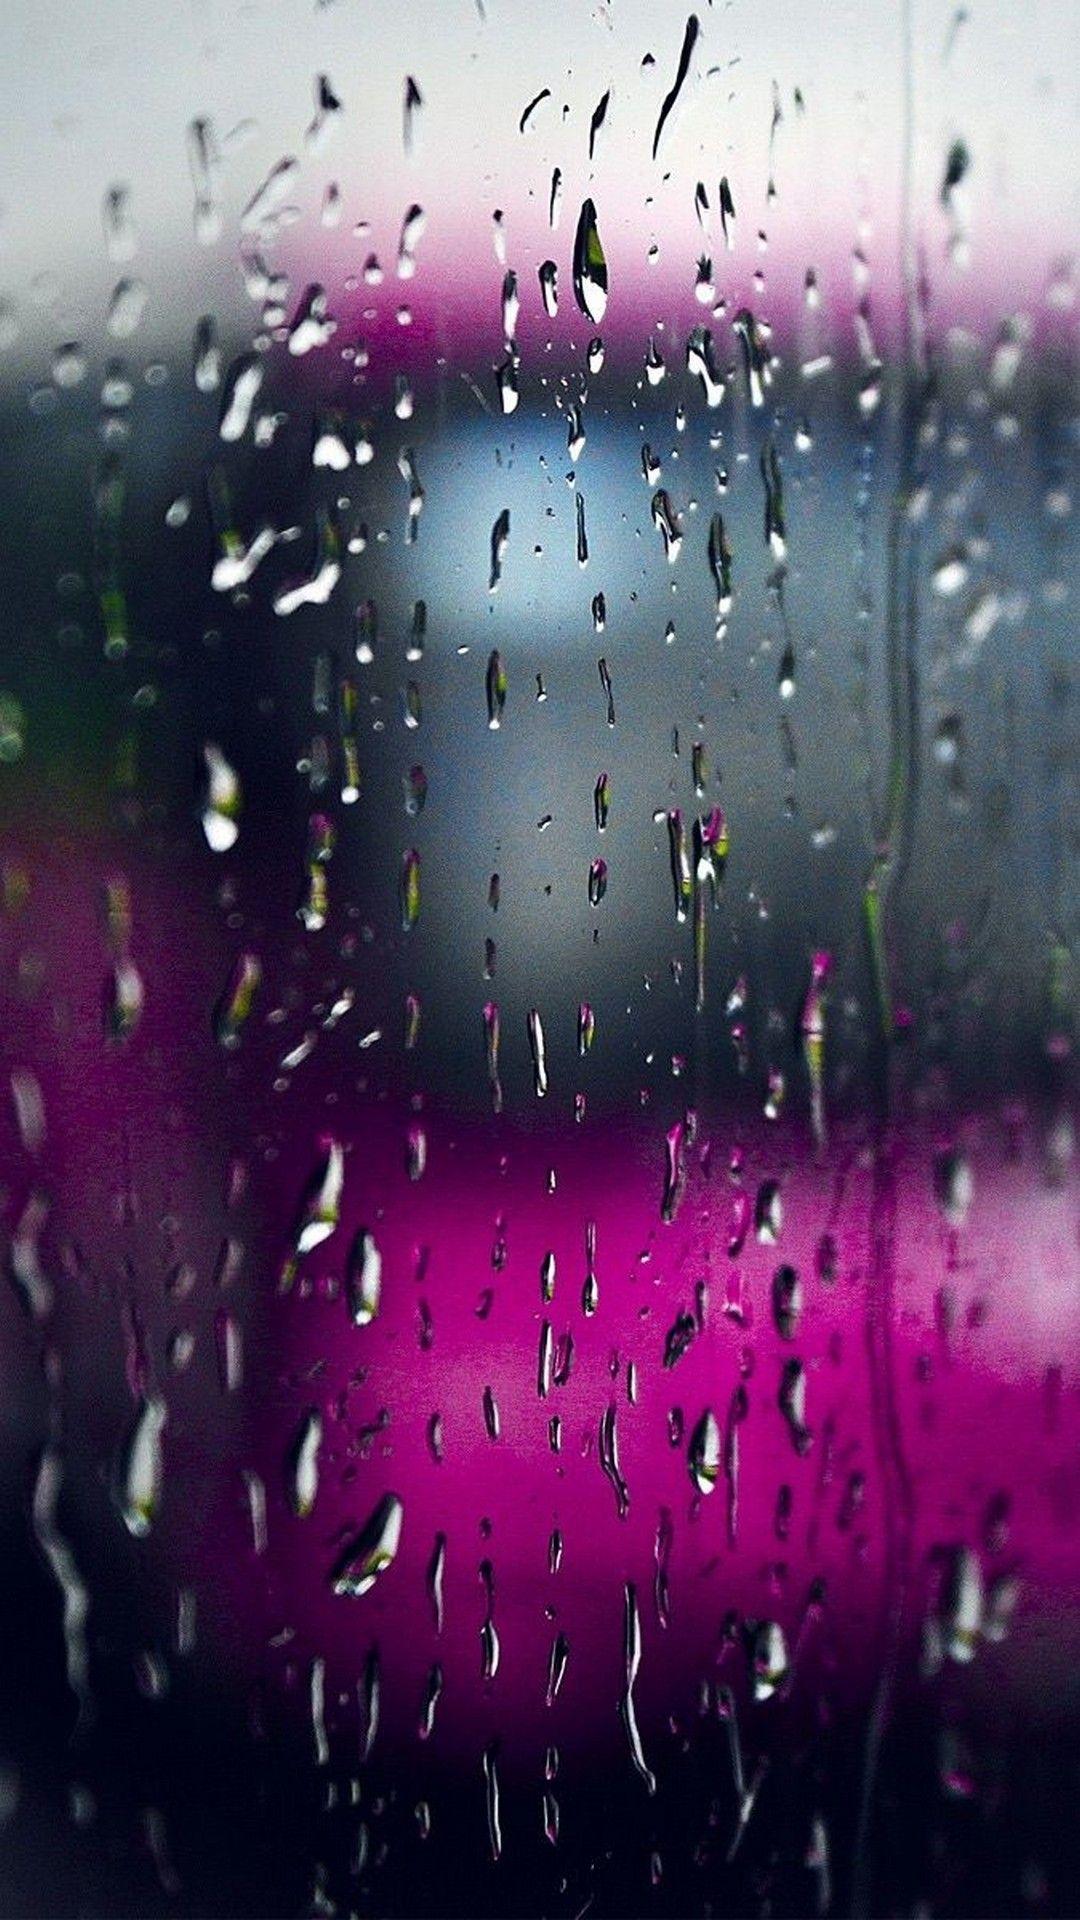 Live Rain Wallpaper For Iphone Iphonewallpapers Iphone Wallpaper